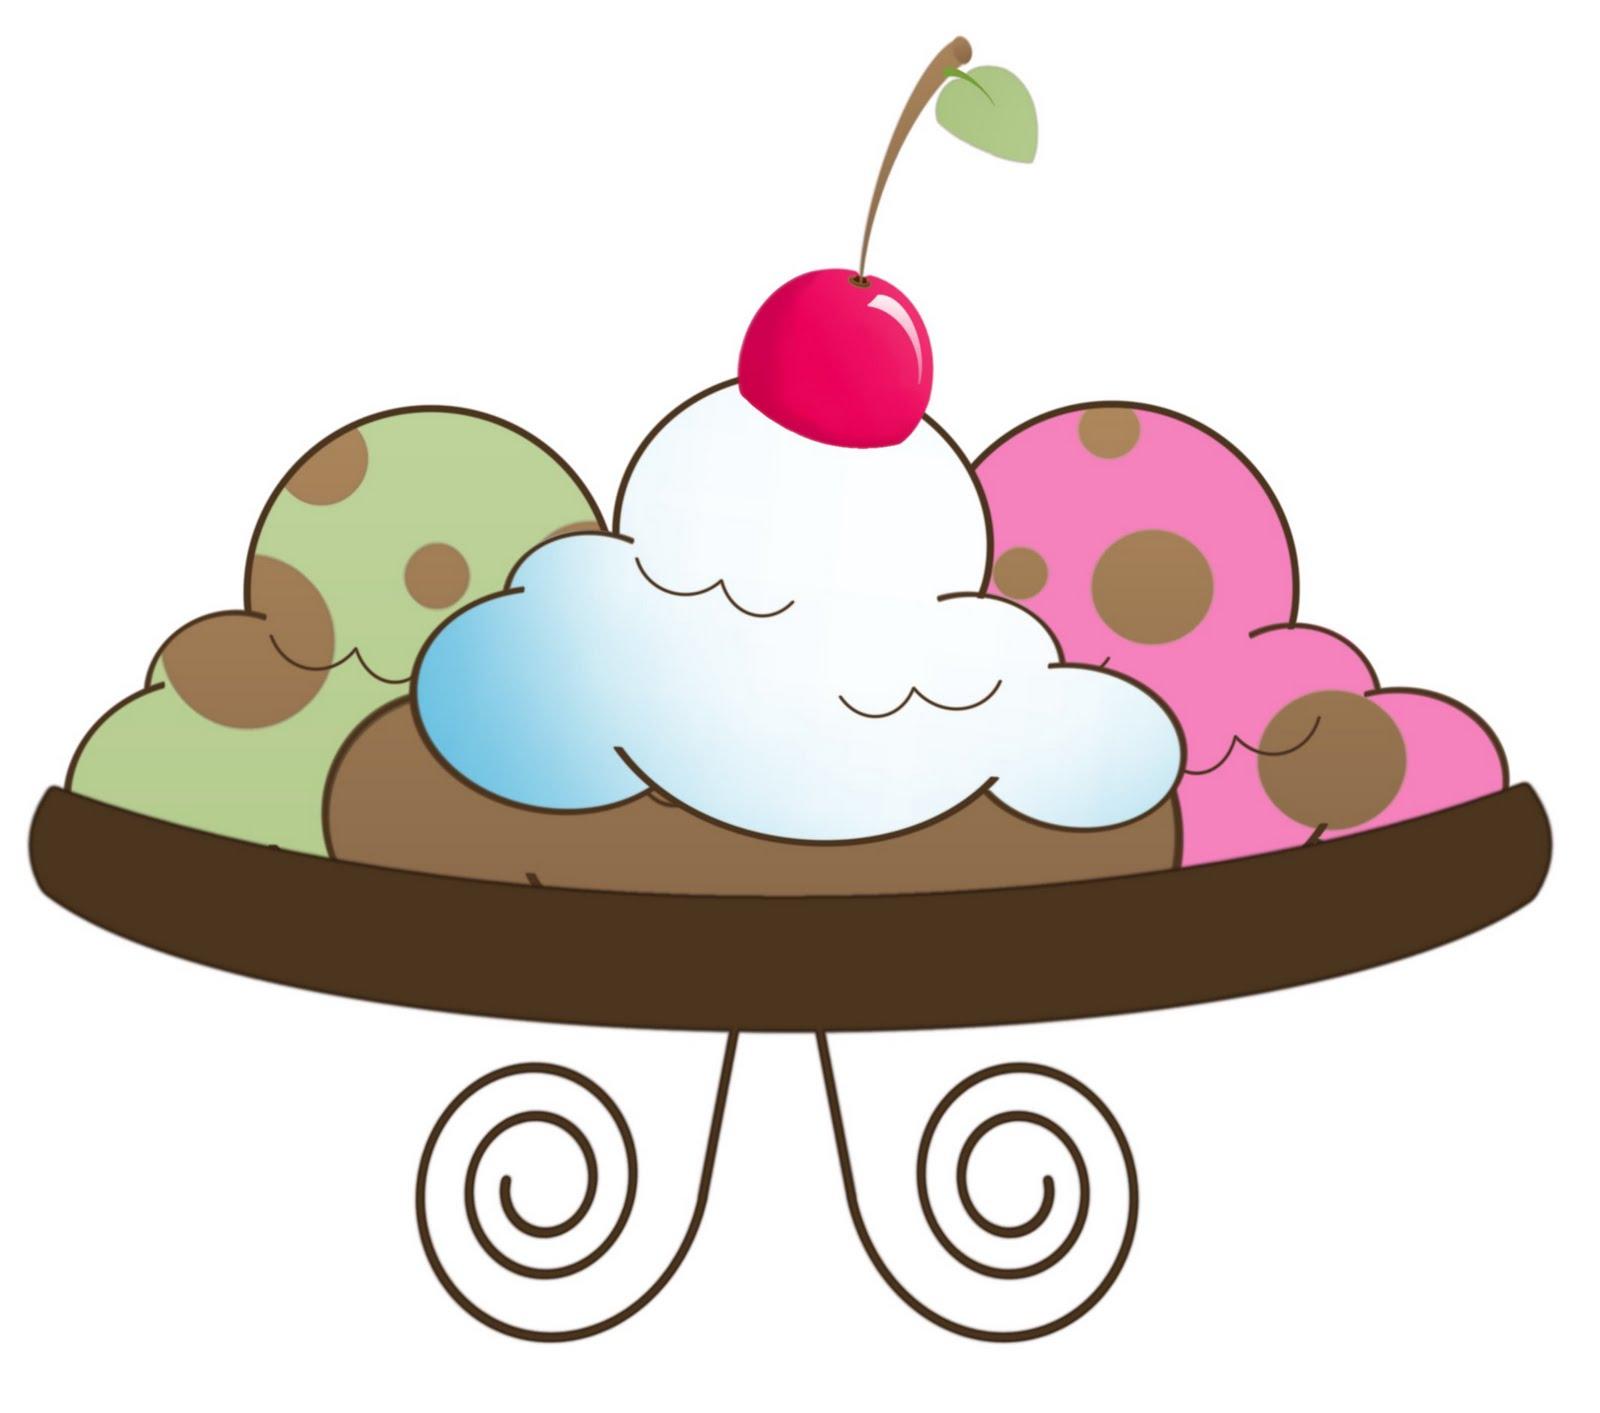 Ice cream sundae clipart cliparts 4-Ice cream sundae clipart cliparts 4-18